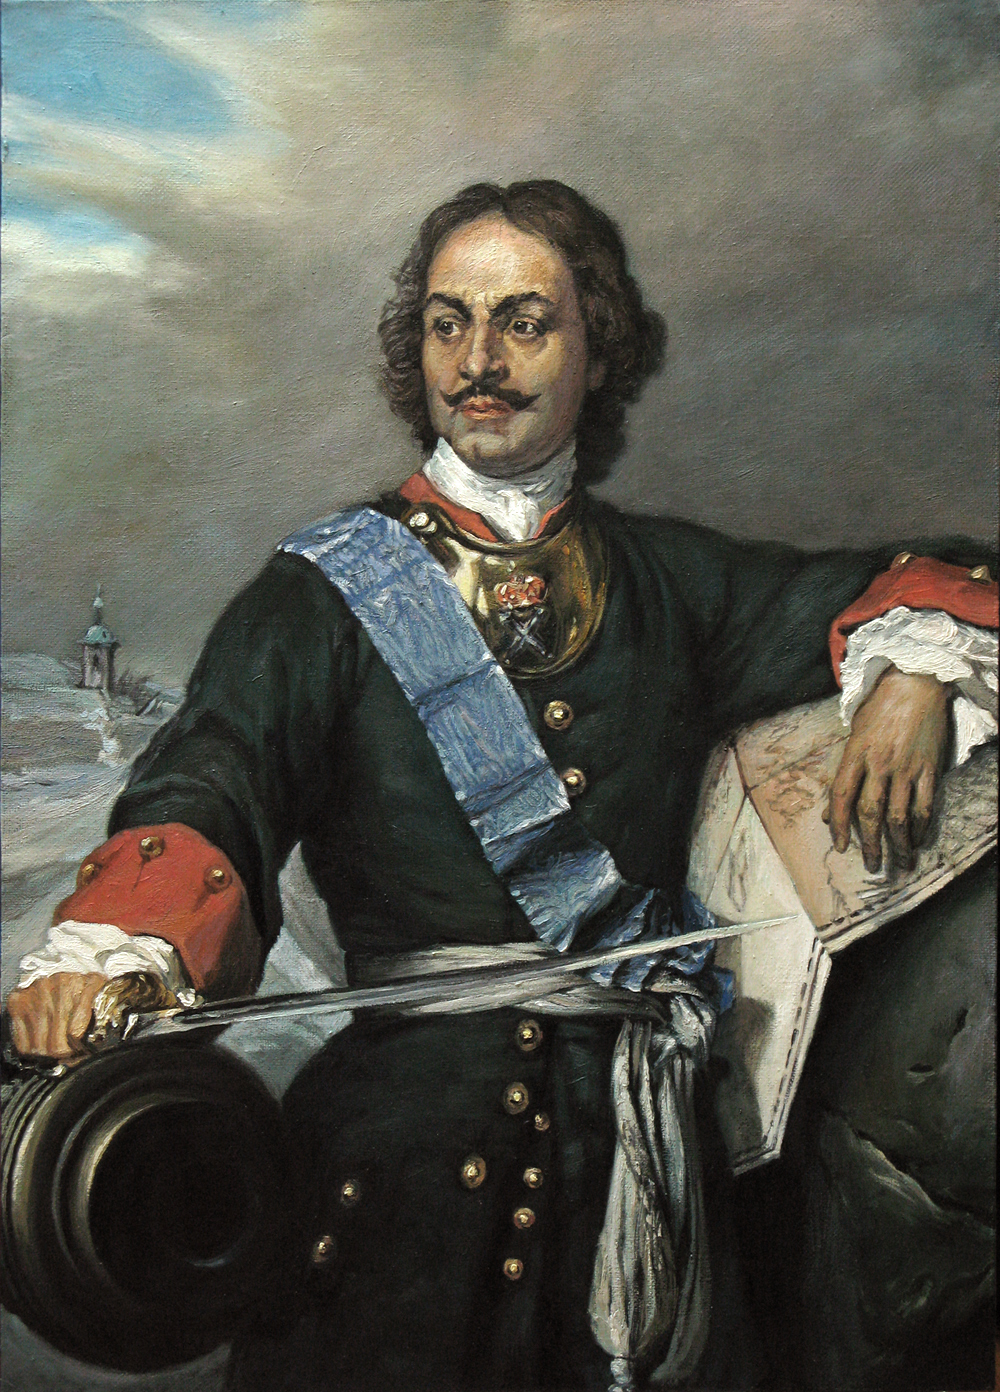 czar peter the great russian tsar r 1689 1725 he en